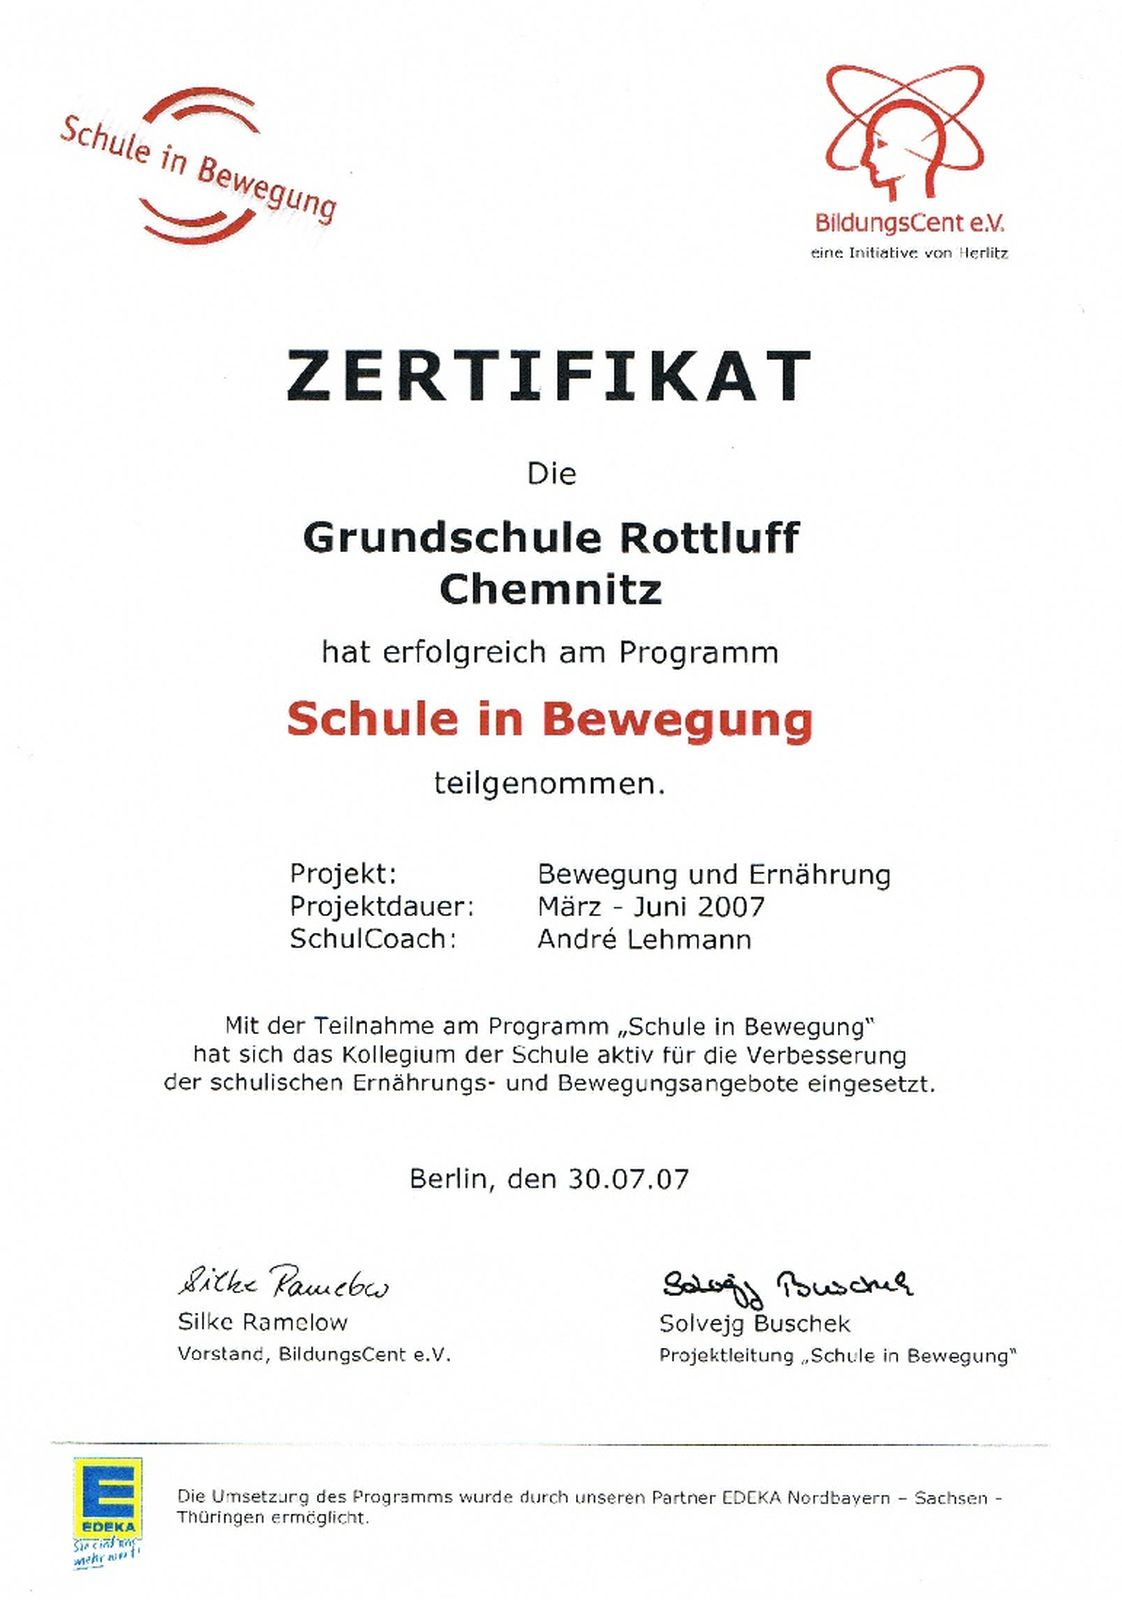 Berühmt Teilnahmezertifikat Vorlagen Galerie - Entry Level Resume ...